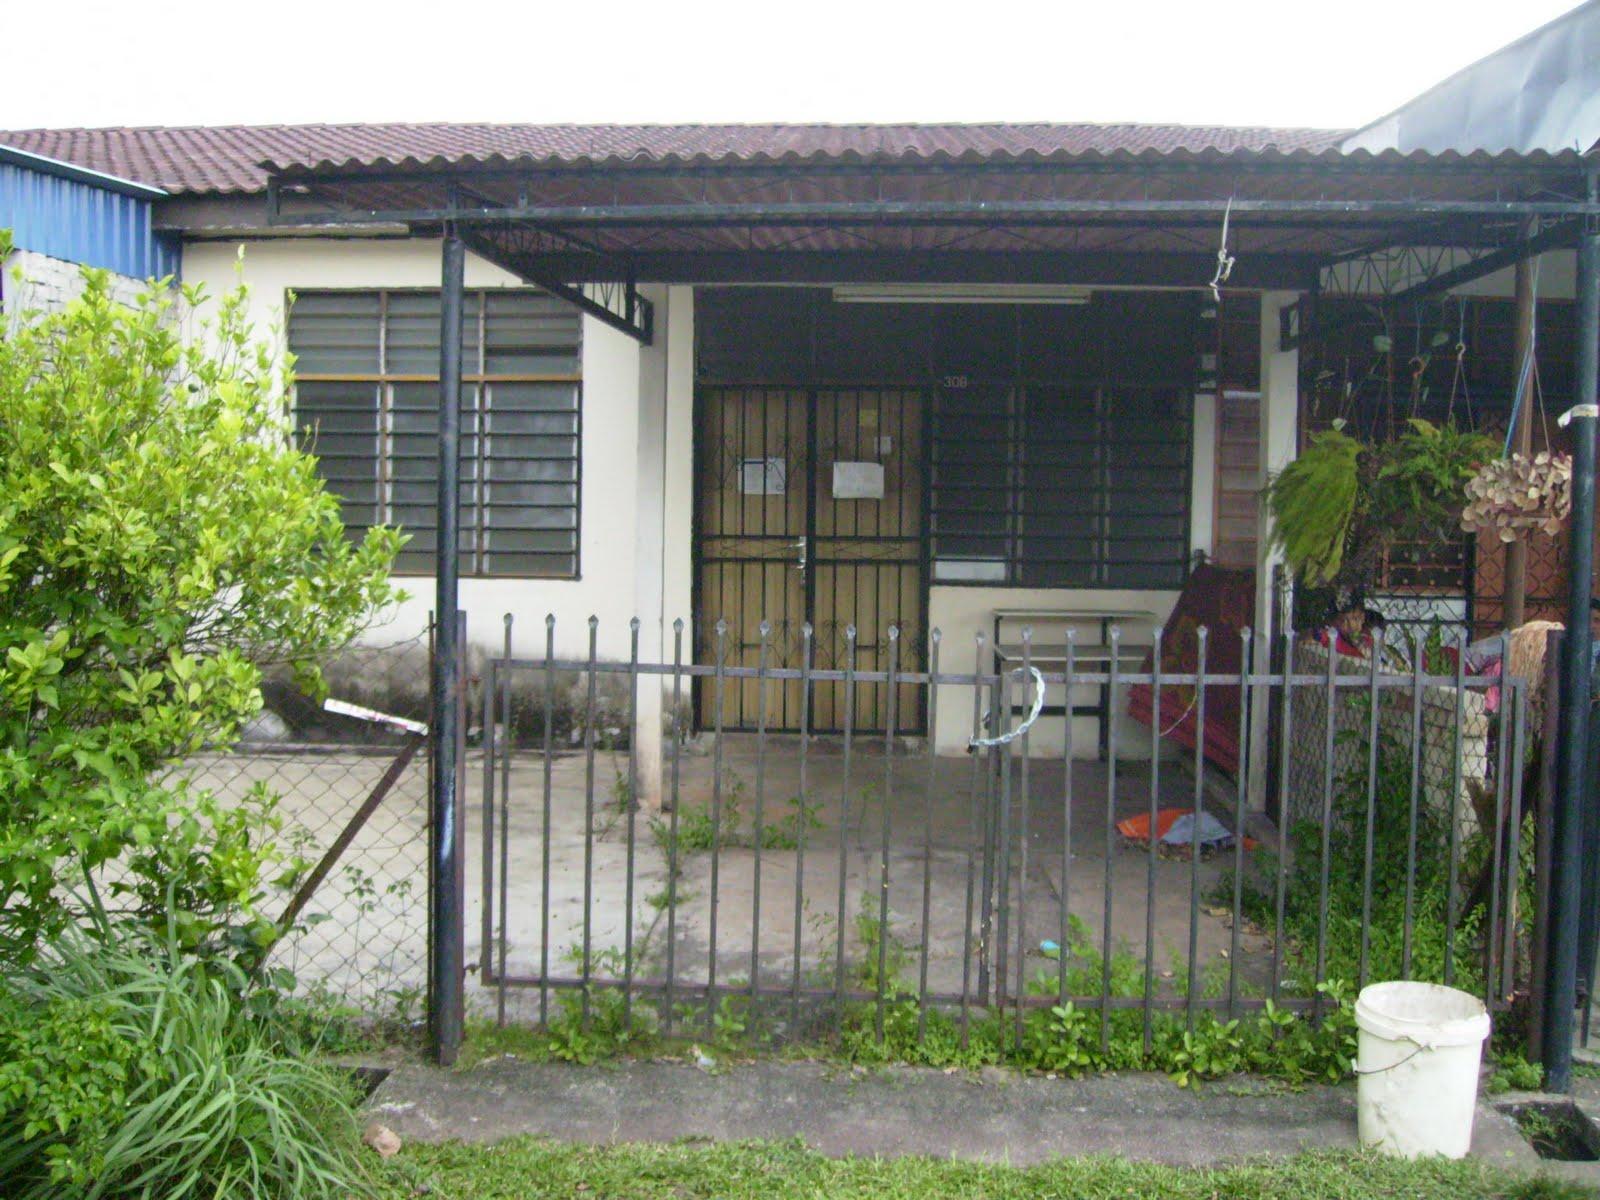 sungai petani singles Kedah property king 219 likes one stop centre for all kedah properties, includes kulim & sungai petani.